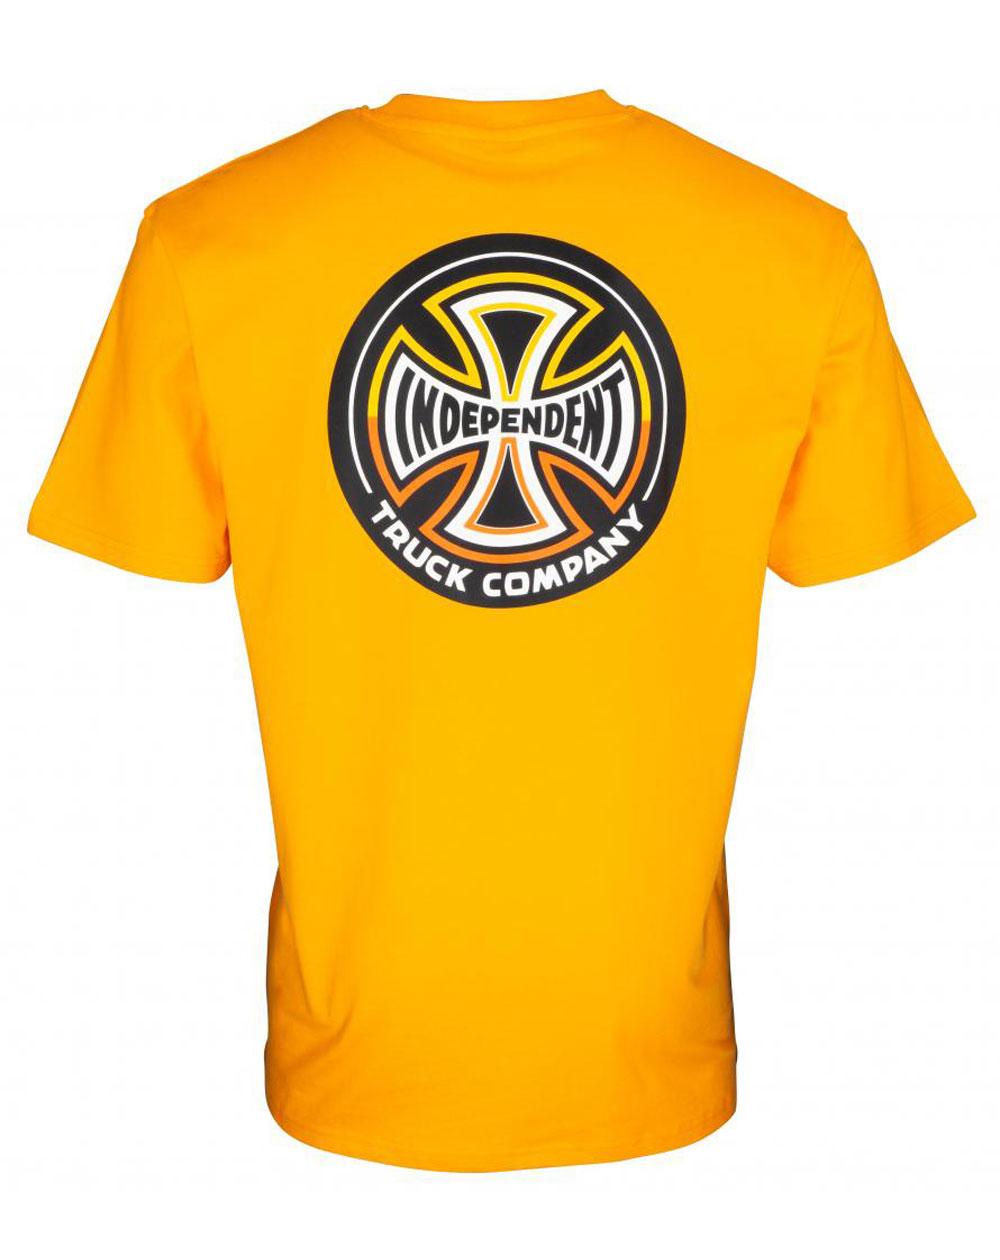 Independent Men's T-Shirt Split Cross Gold